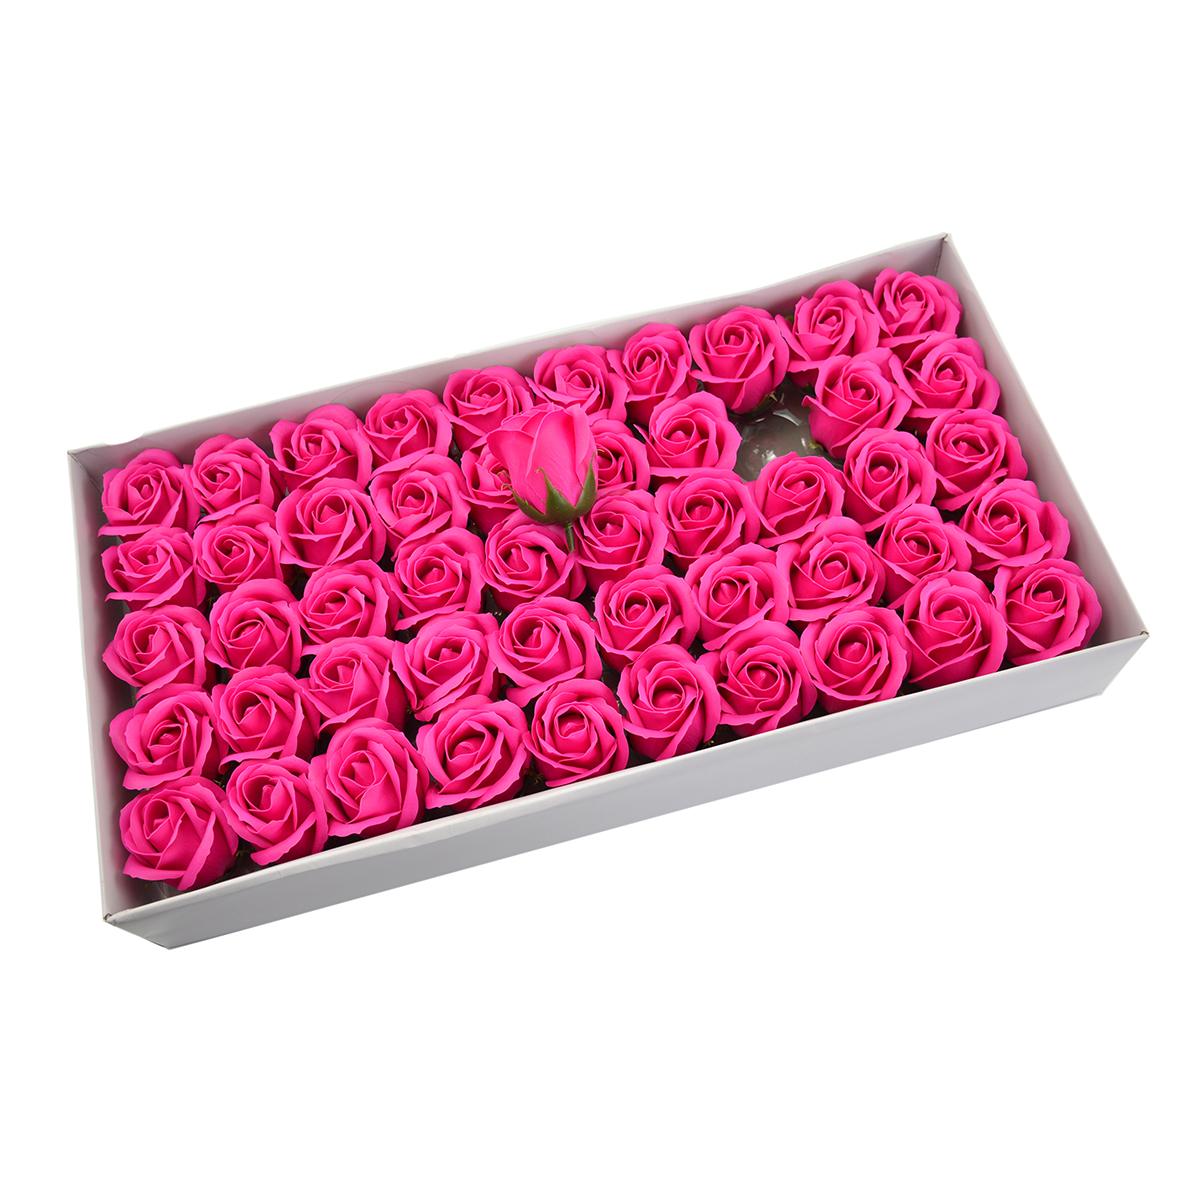 Set di 50 rose di sapone profumate, real touch, rosa intenso